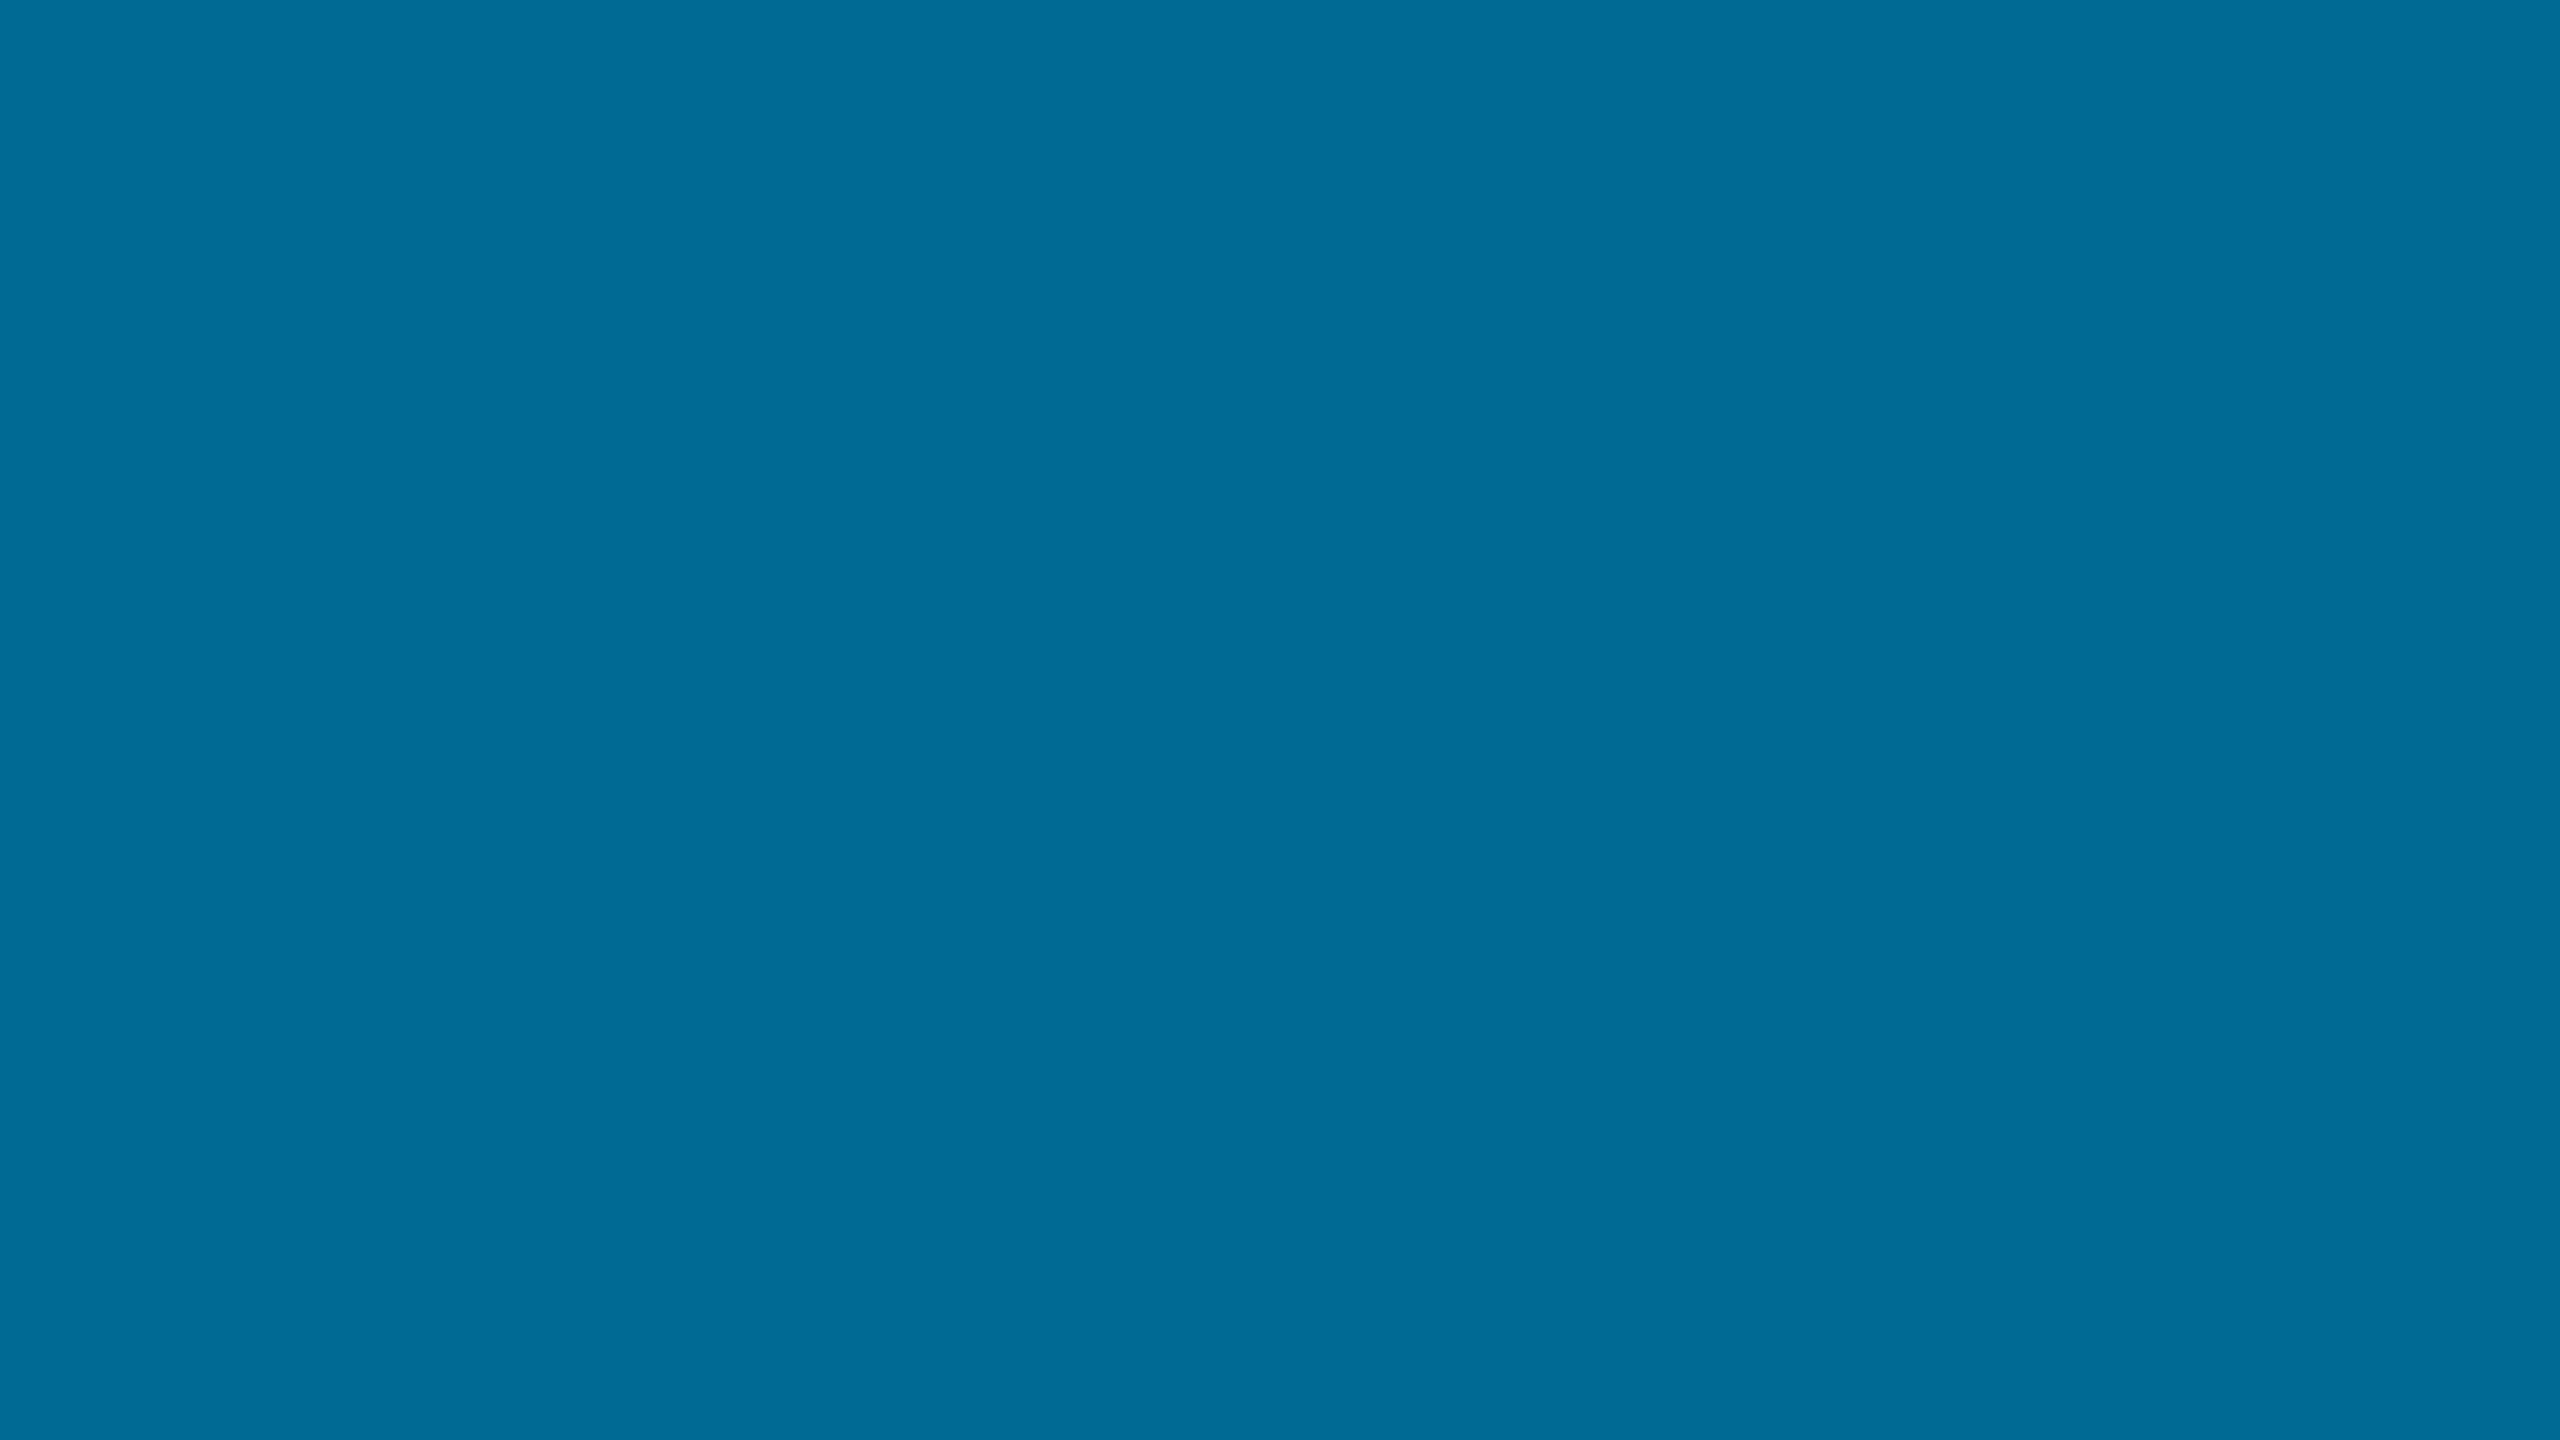 Синий фон цвет